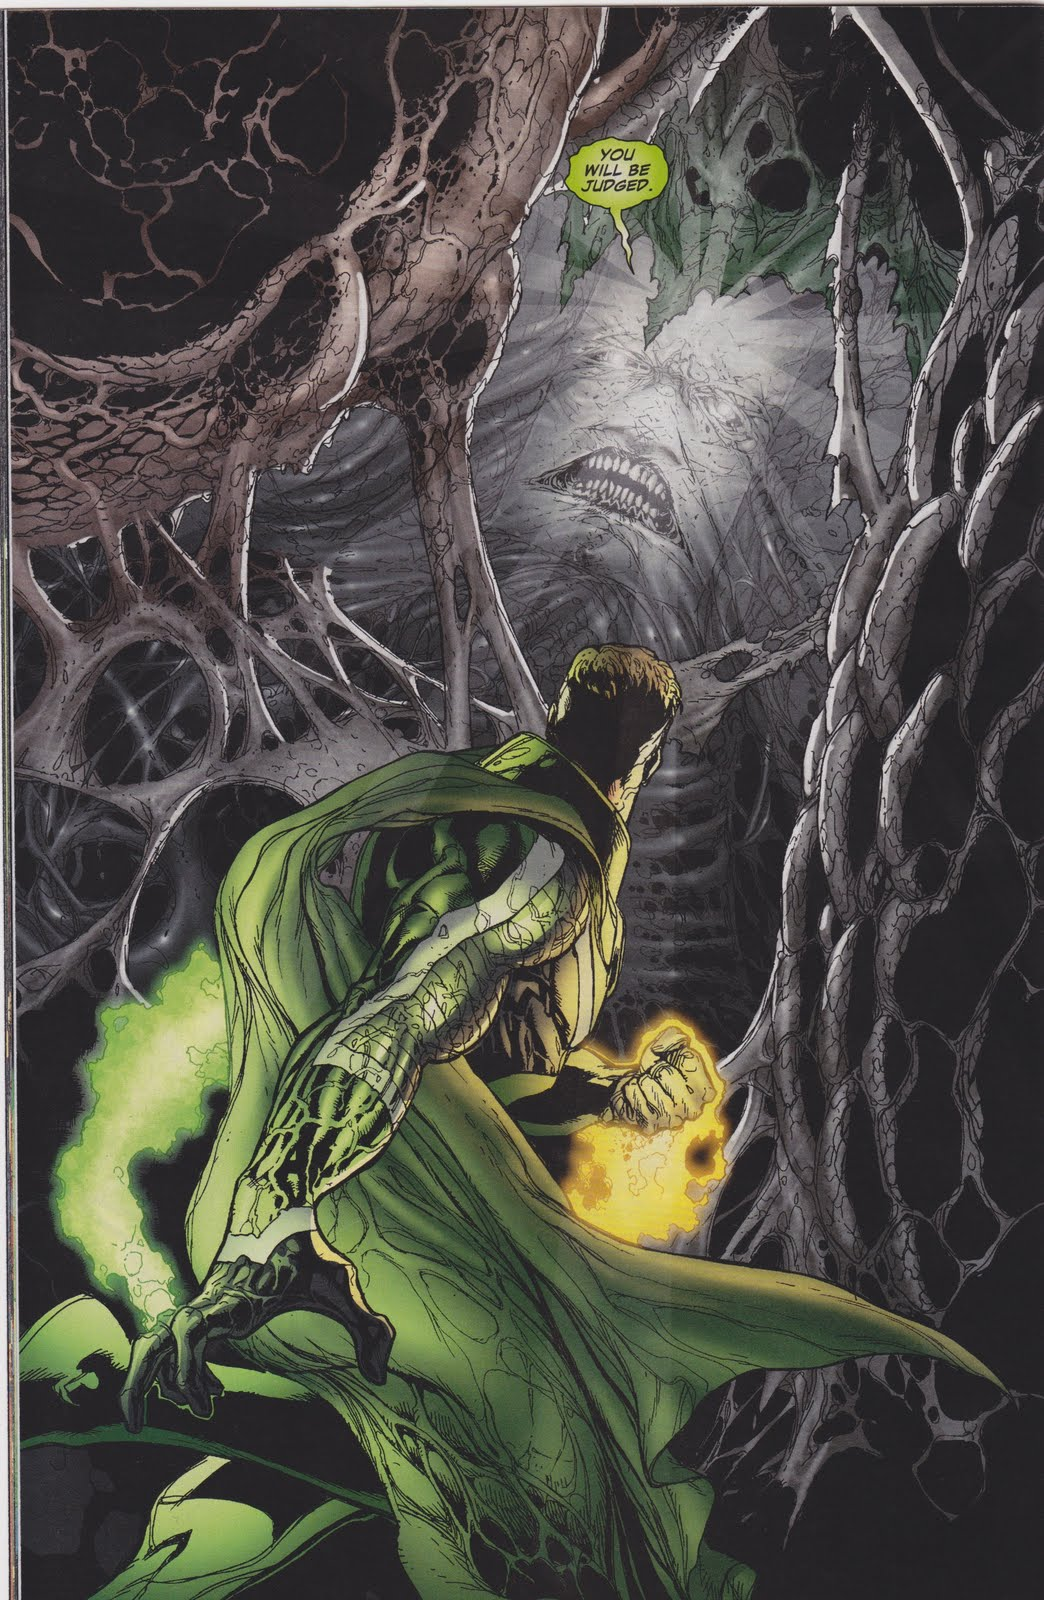 [green_lantern51_doug_mahnke1.jpeg]